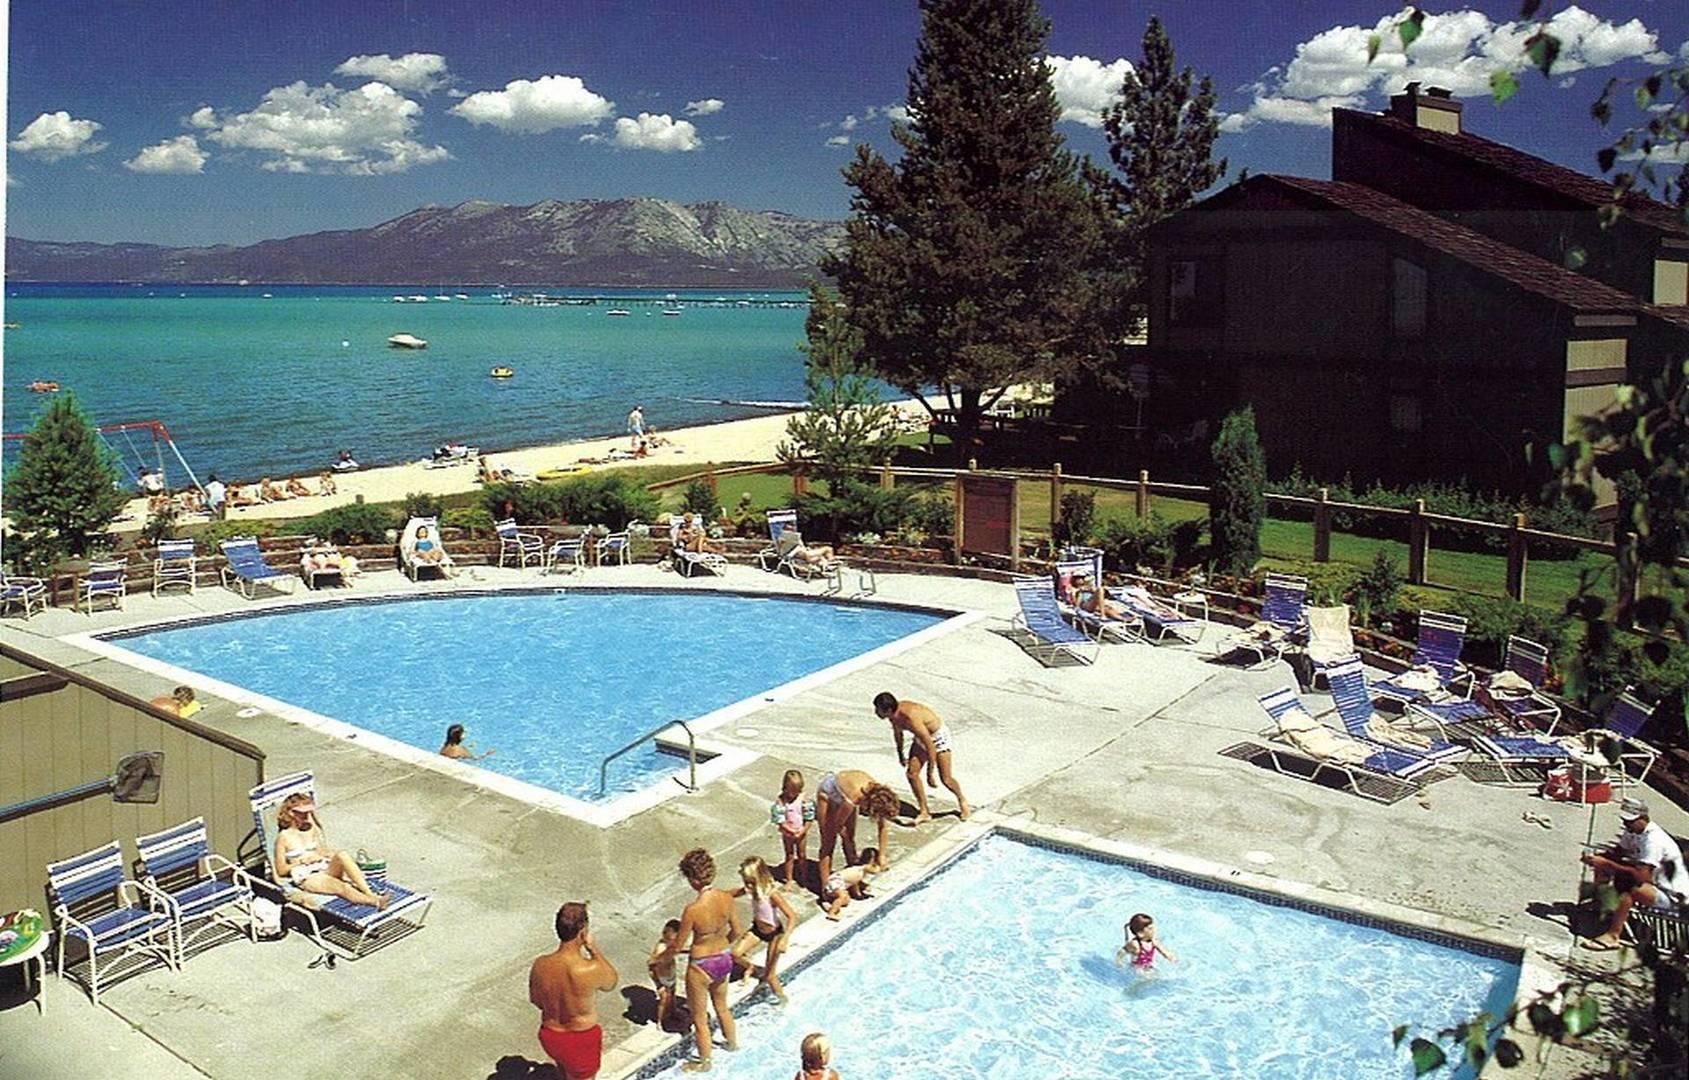 llc0860 pool